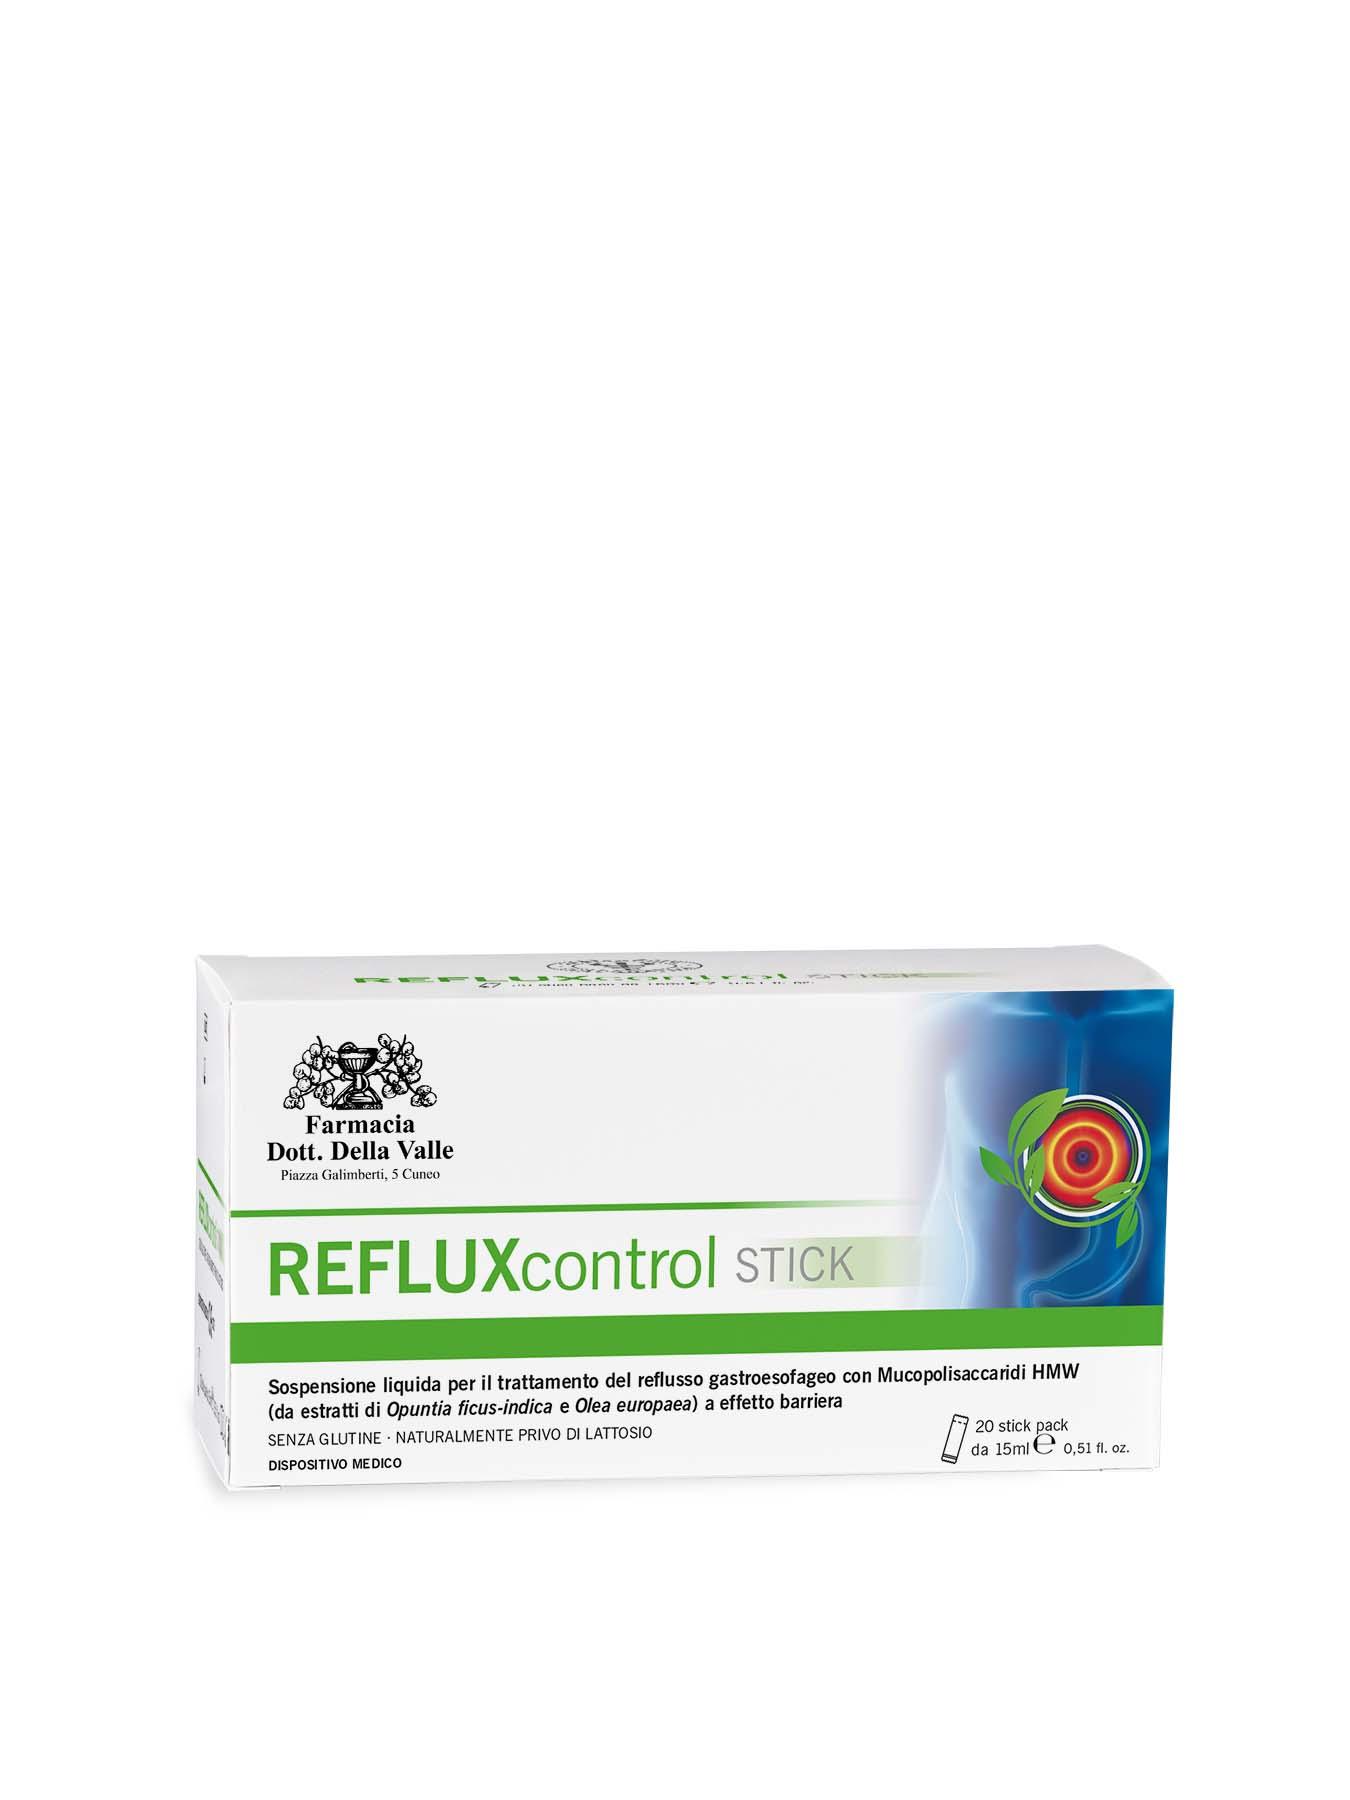 LFP REFLUX CONTROL STICK